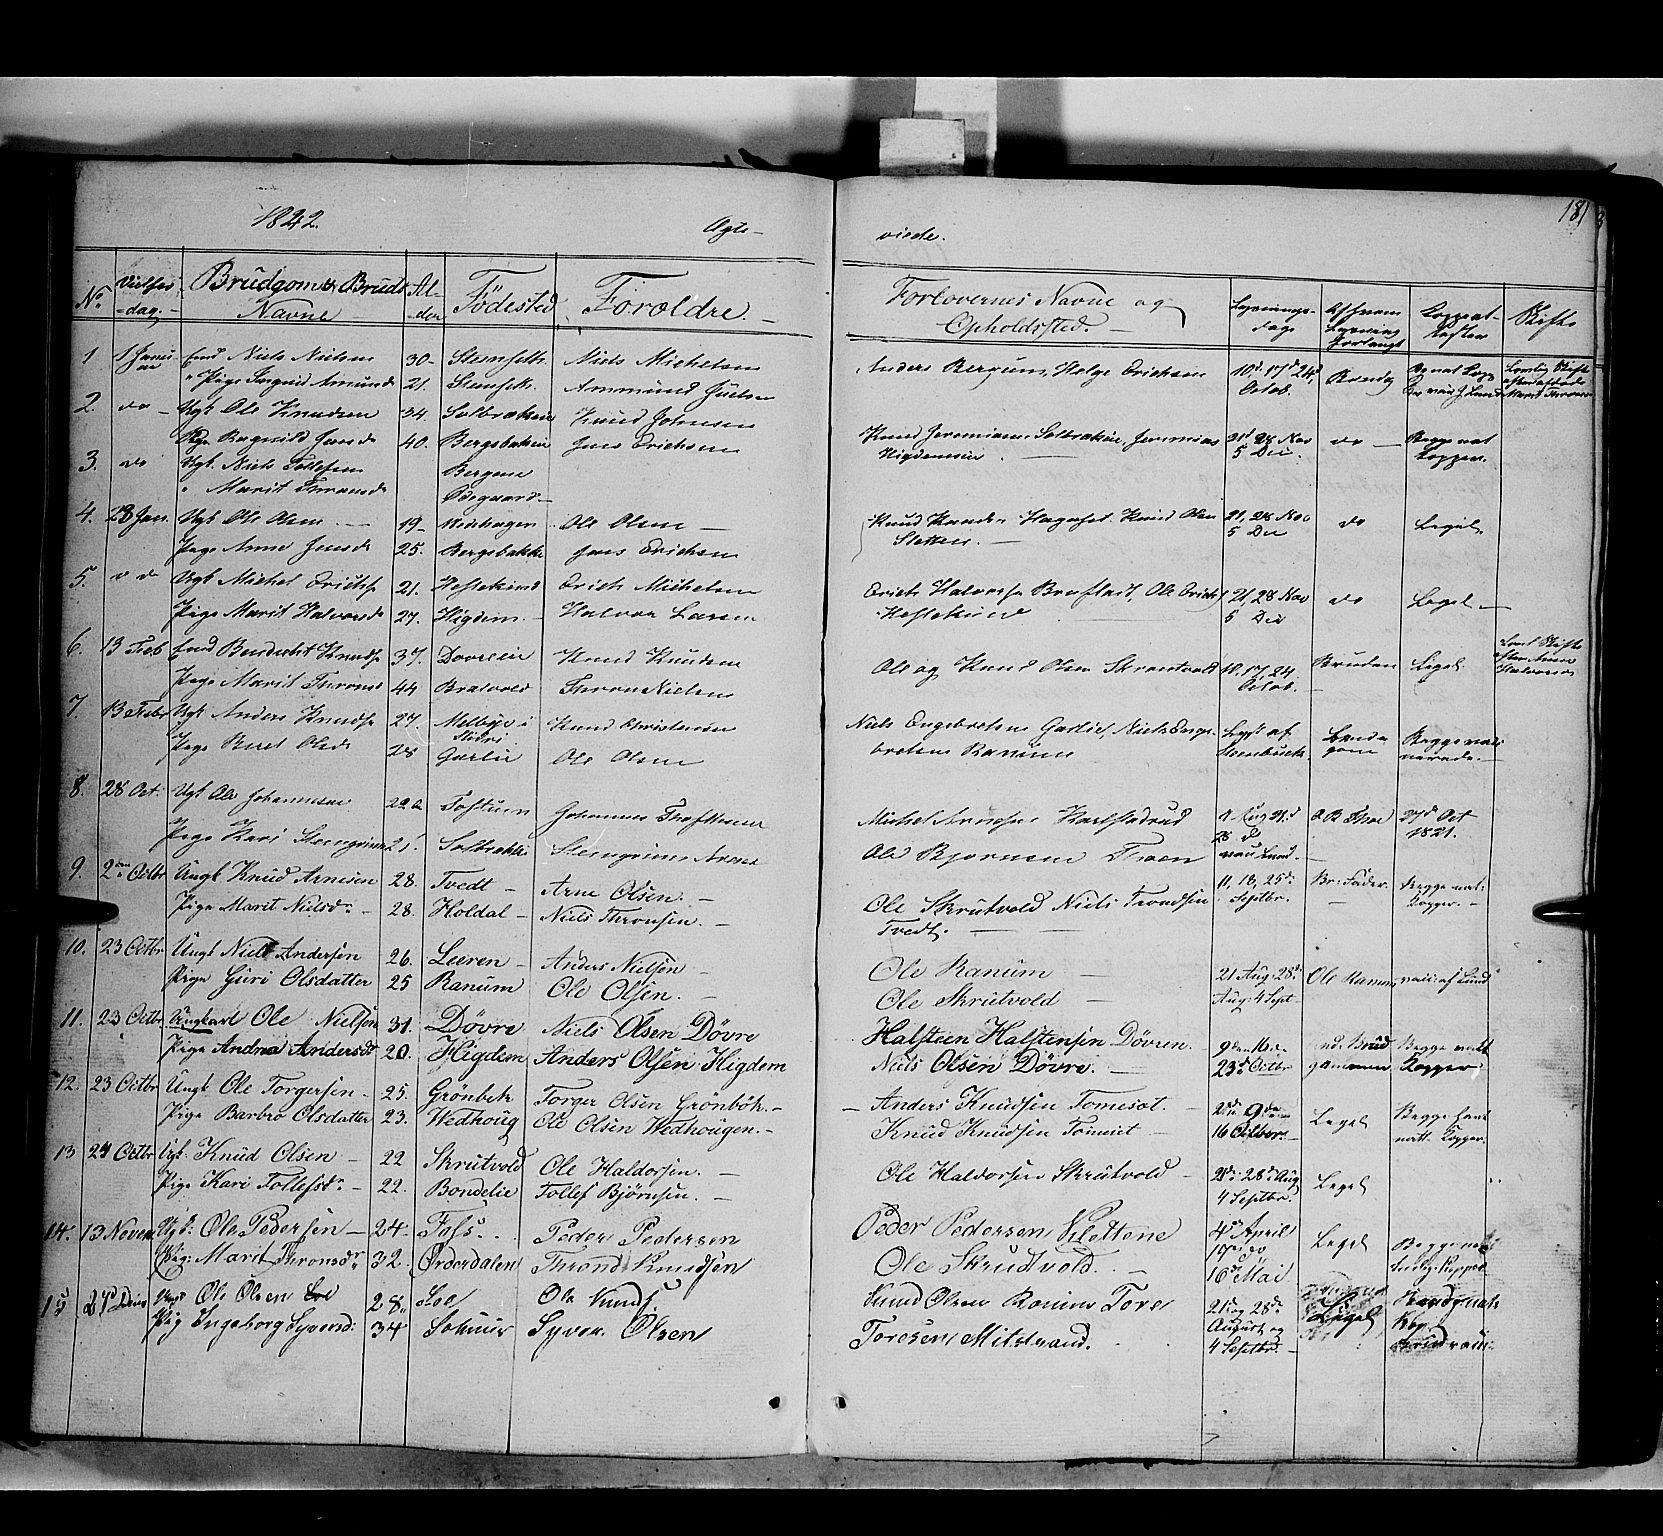 SAH, Nord-Aurdal prestekontor, Ministerialbok nr. 7, 1842-1863, s. 181